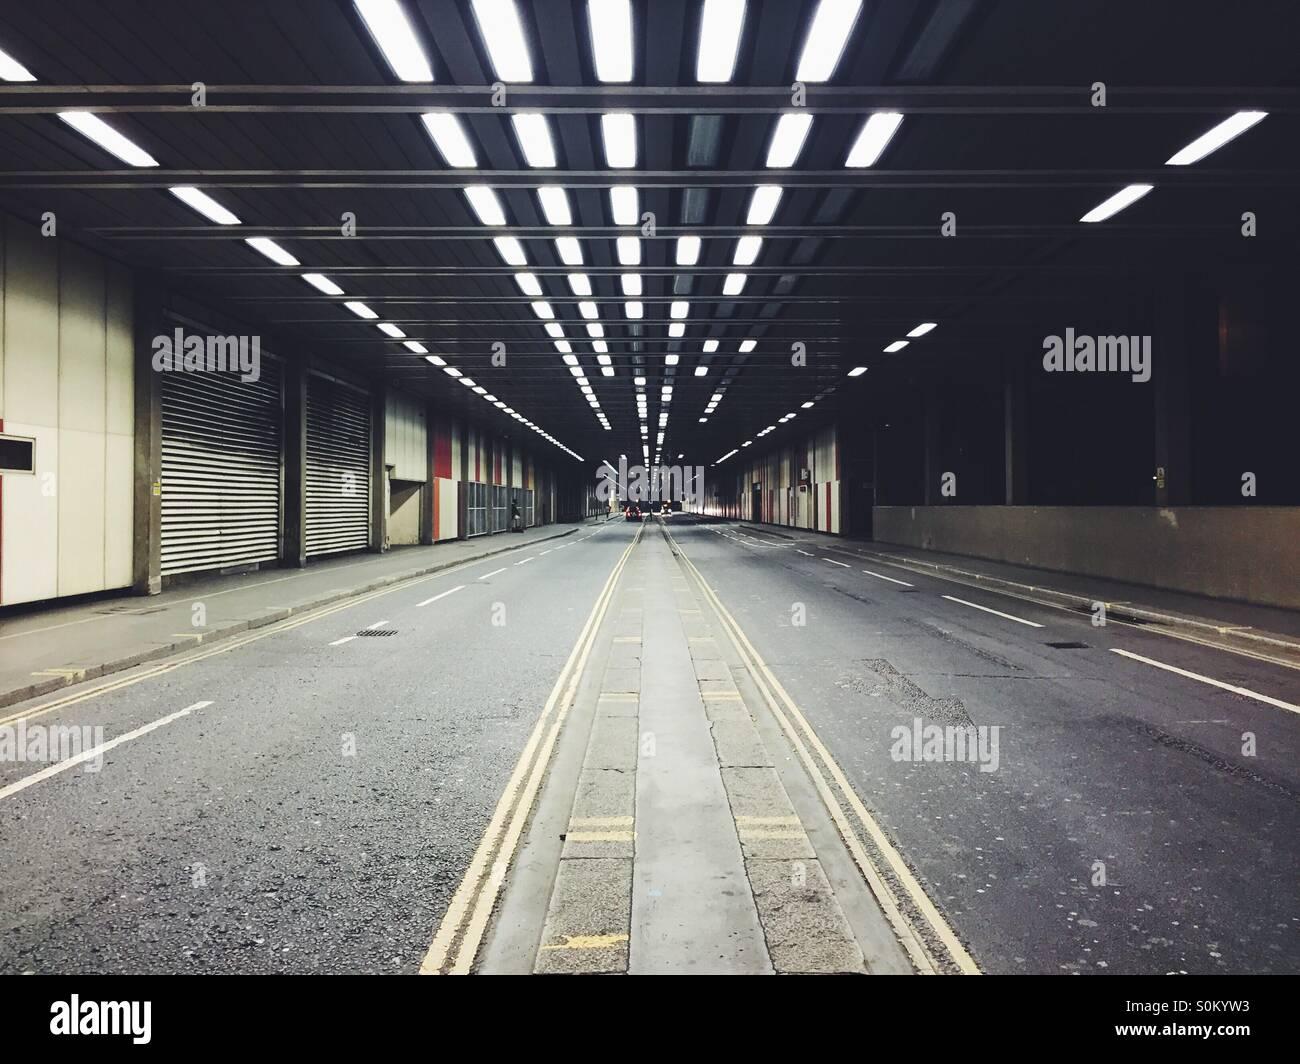 Abstract tunnel lighting, Barbican, London. - Stock Image